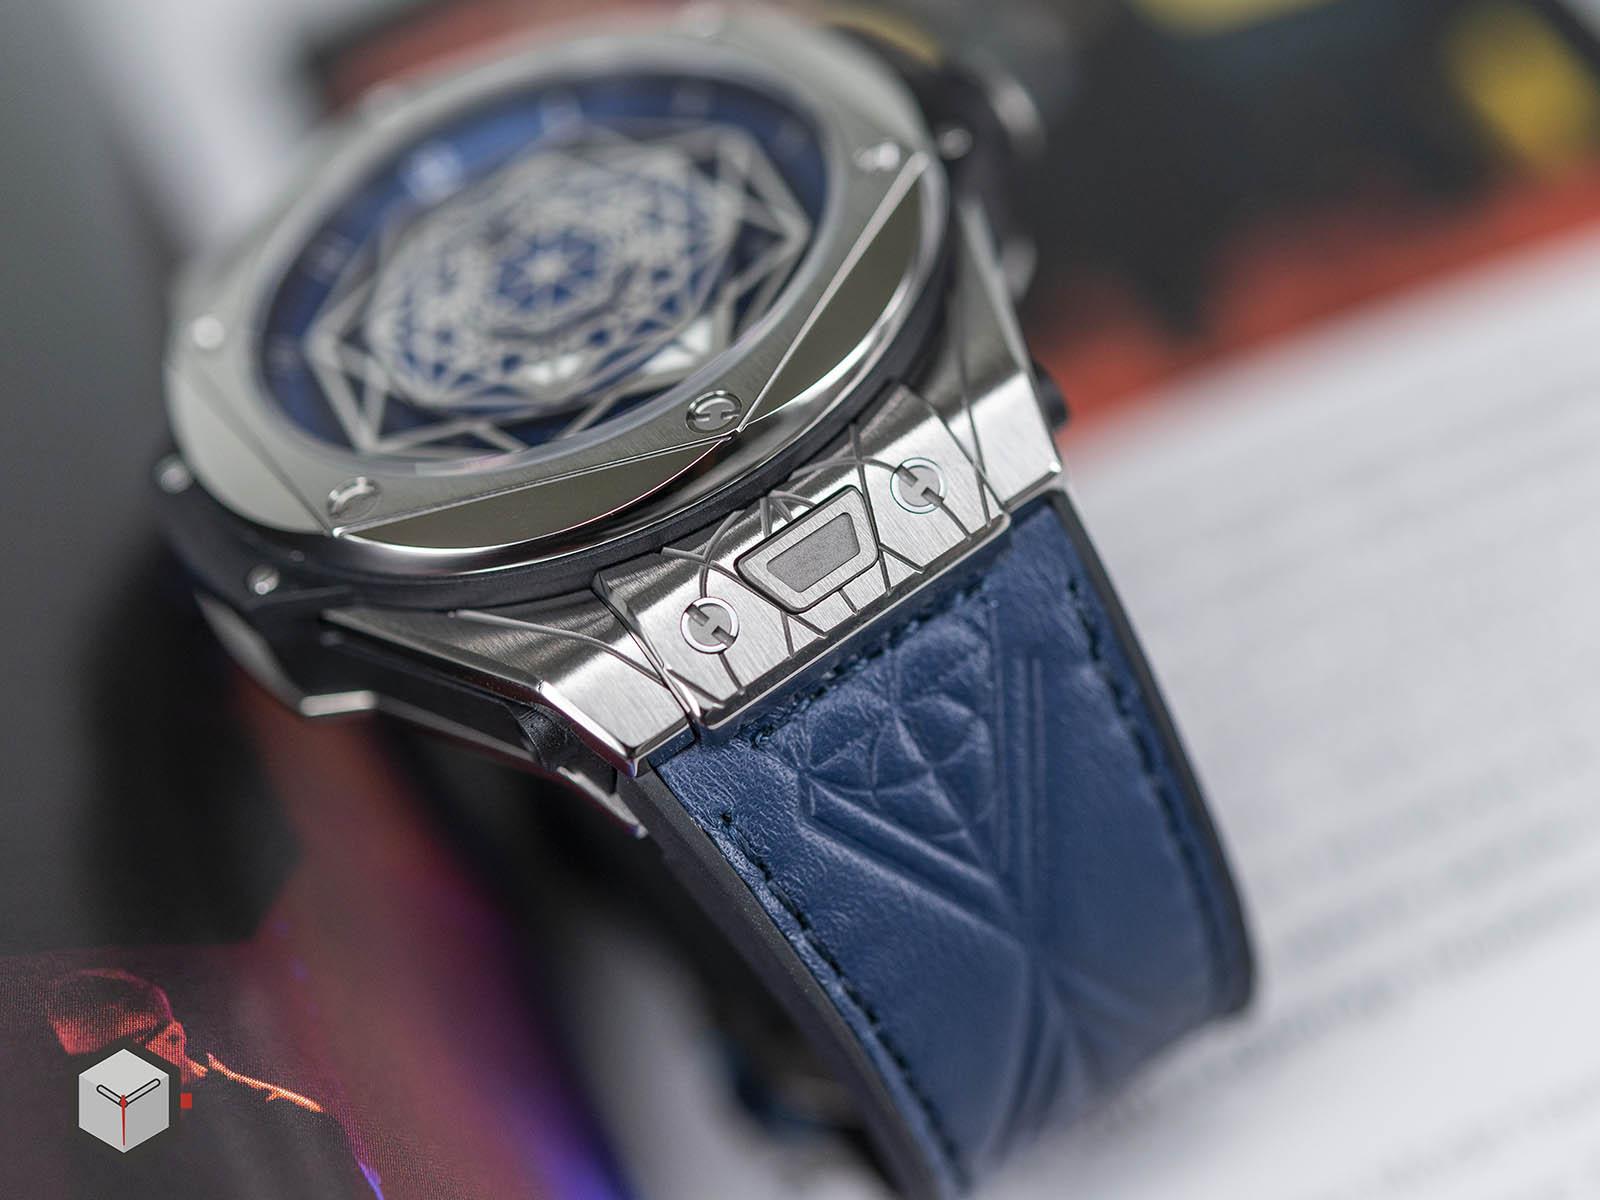 415-nx-7179-vr-mxm18-hublot-big-bang-sang-bleu-titanium-blue-6.jpg